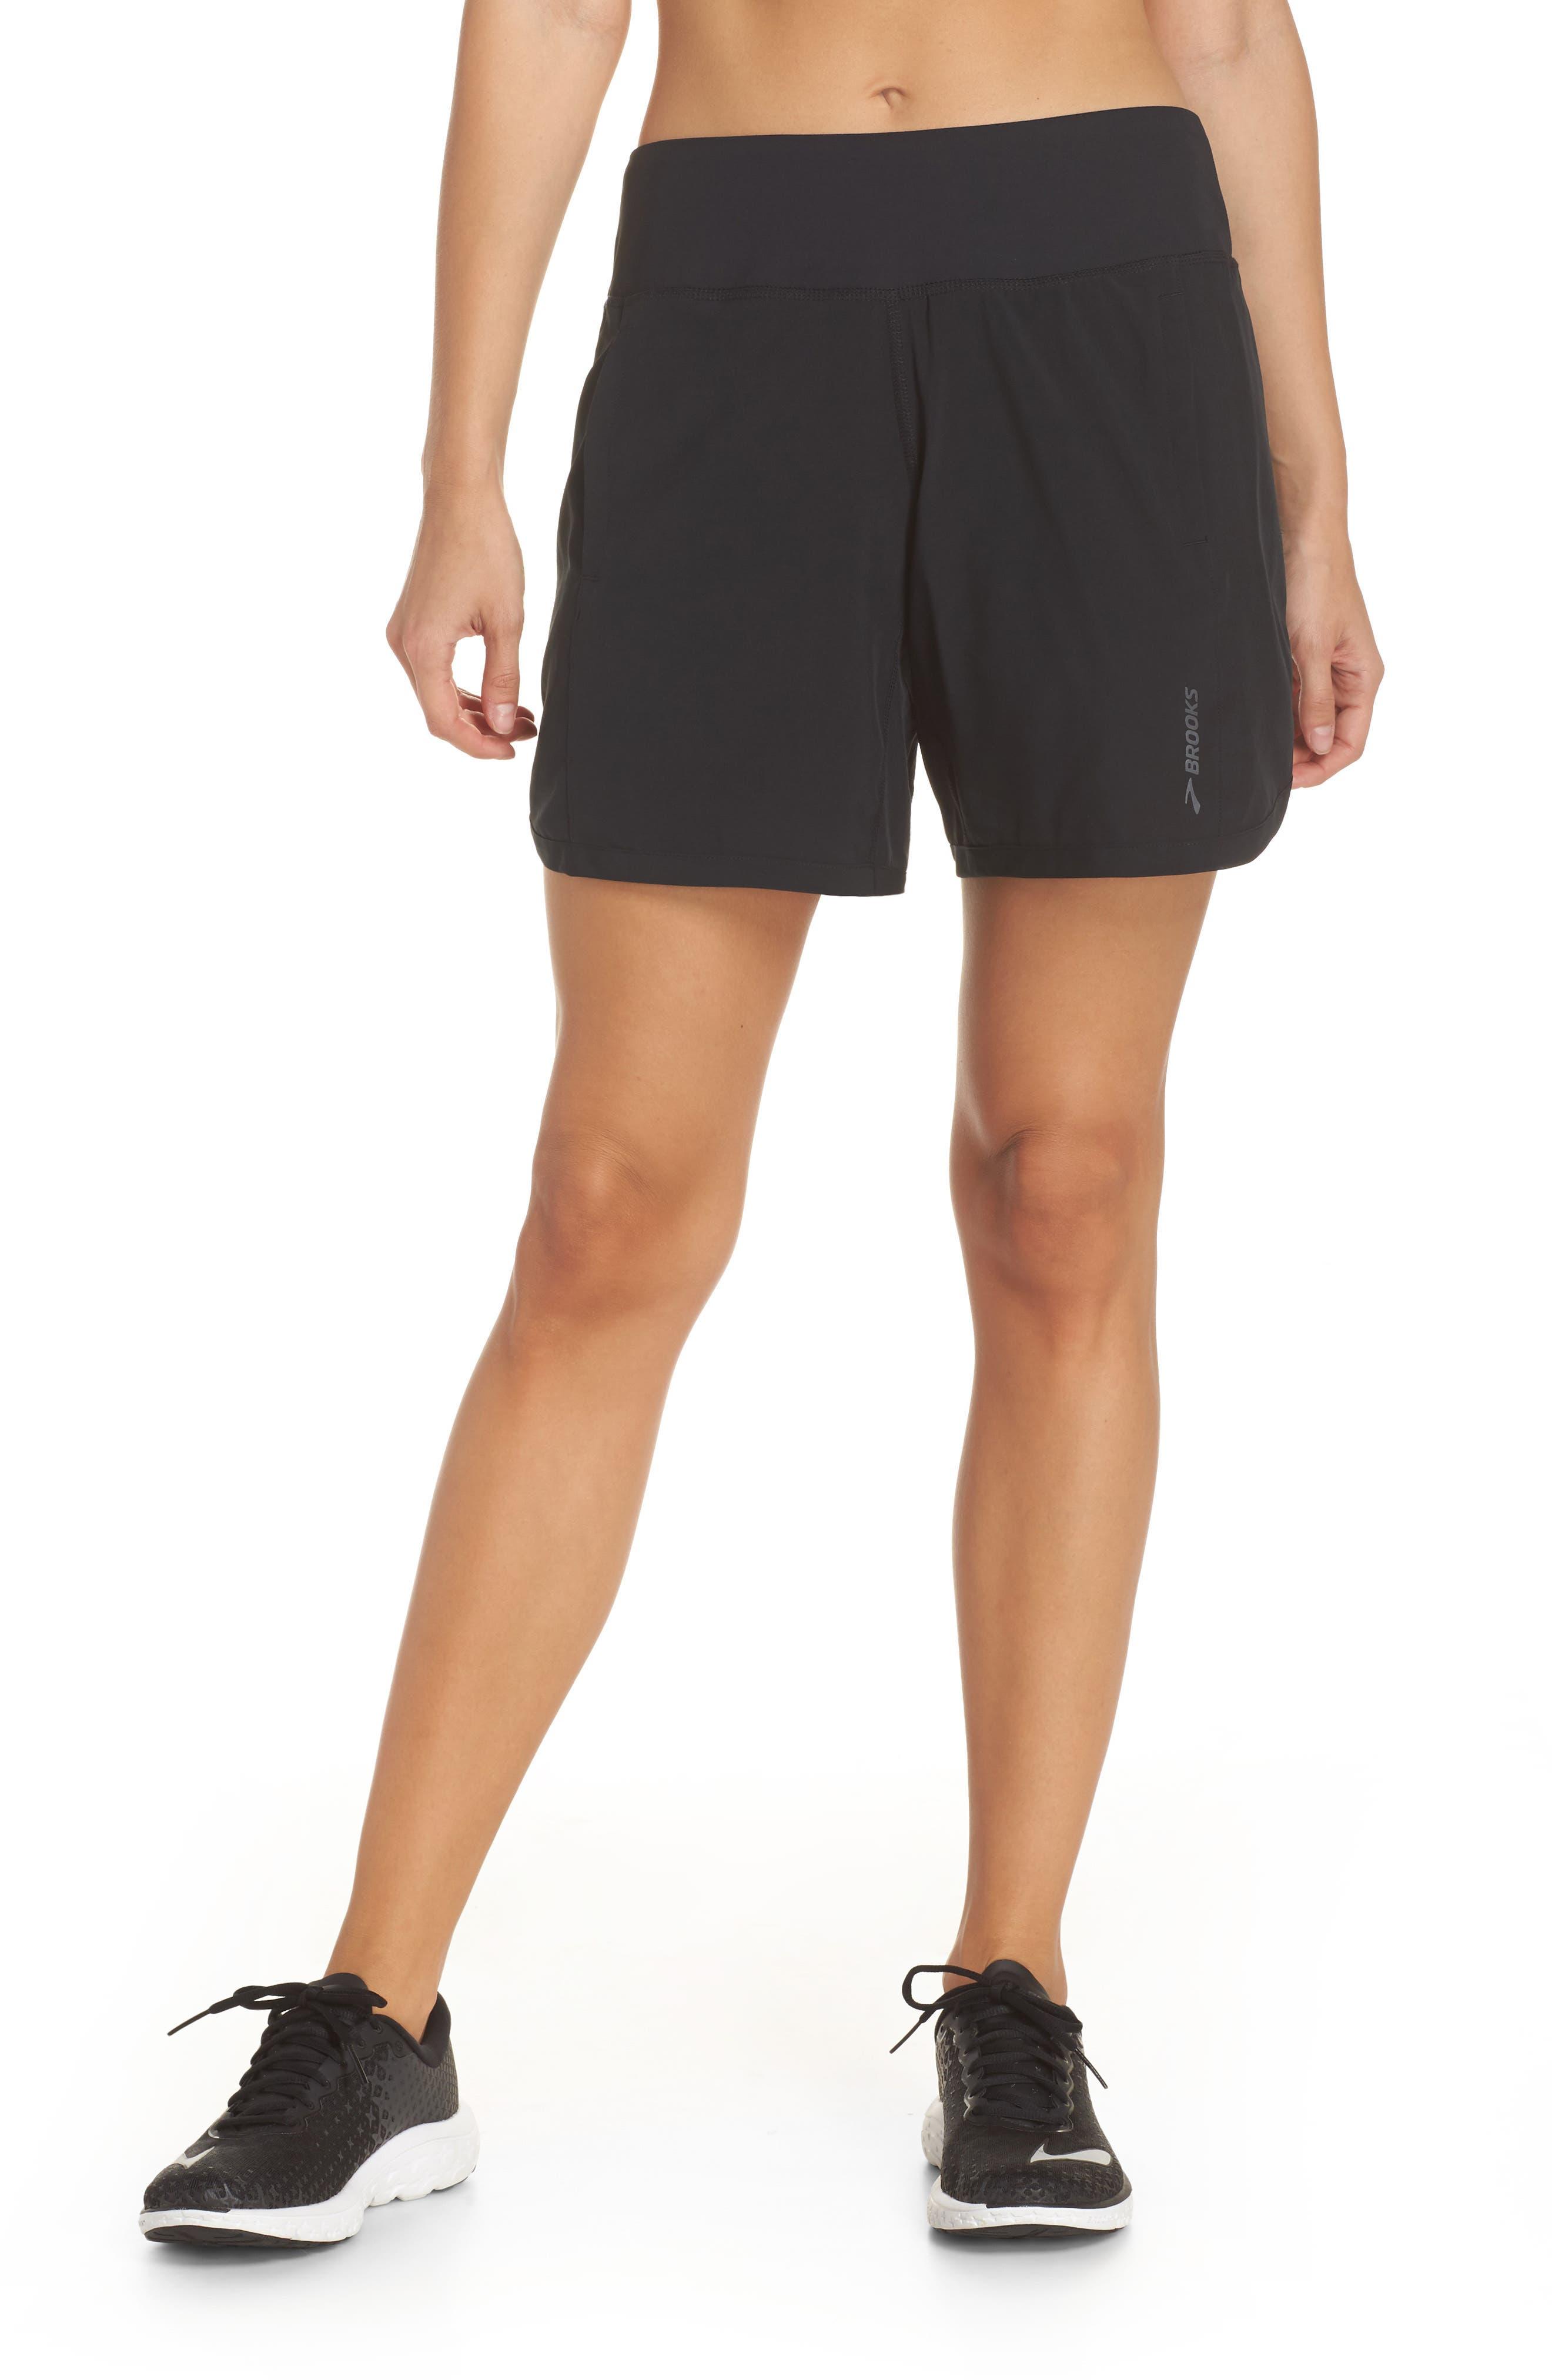 Chaser 7 Shorts,                         Main,                         color, Black